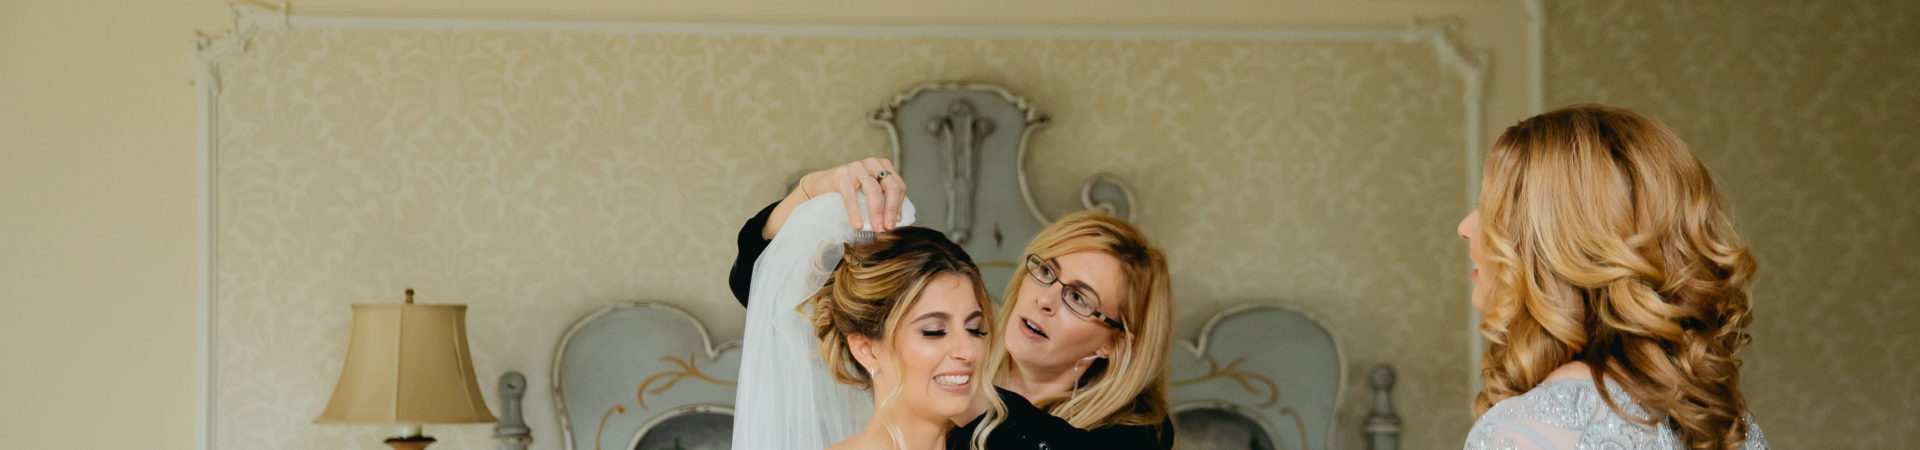 wedding planner placing veil on bride's head